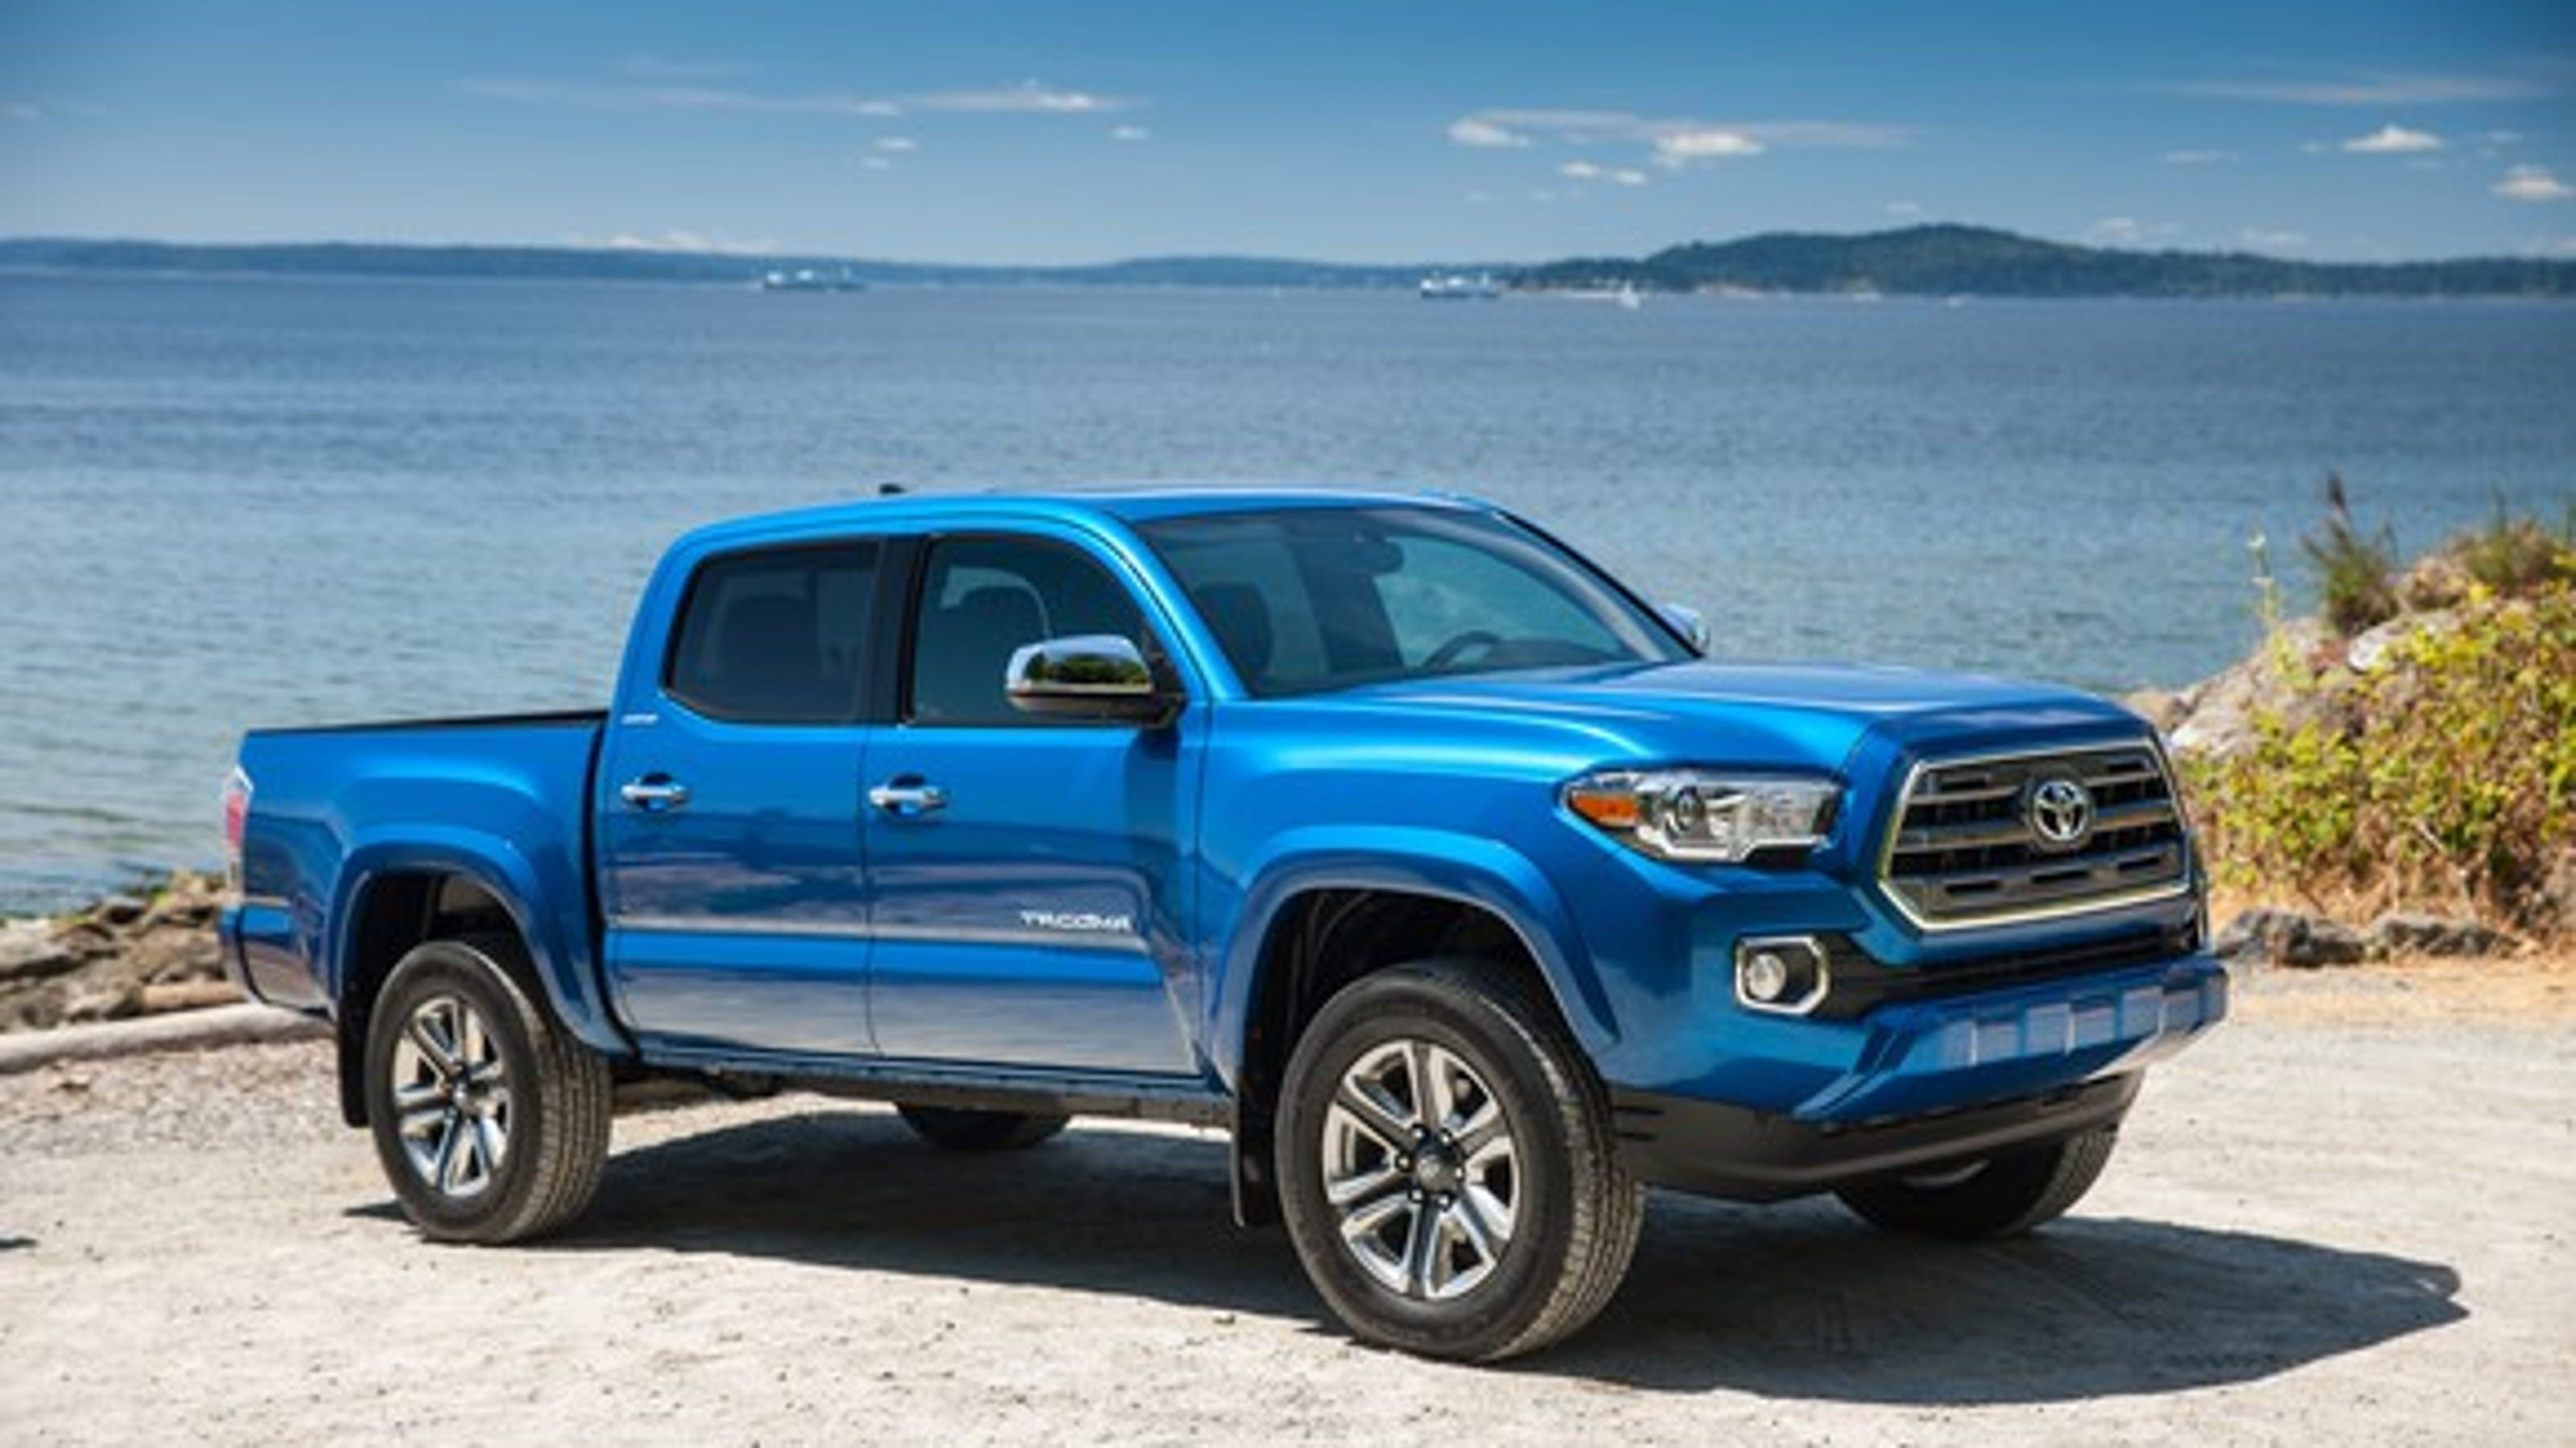 Toyota recalls quarter million Ta a pickups over oil leaks